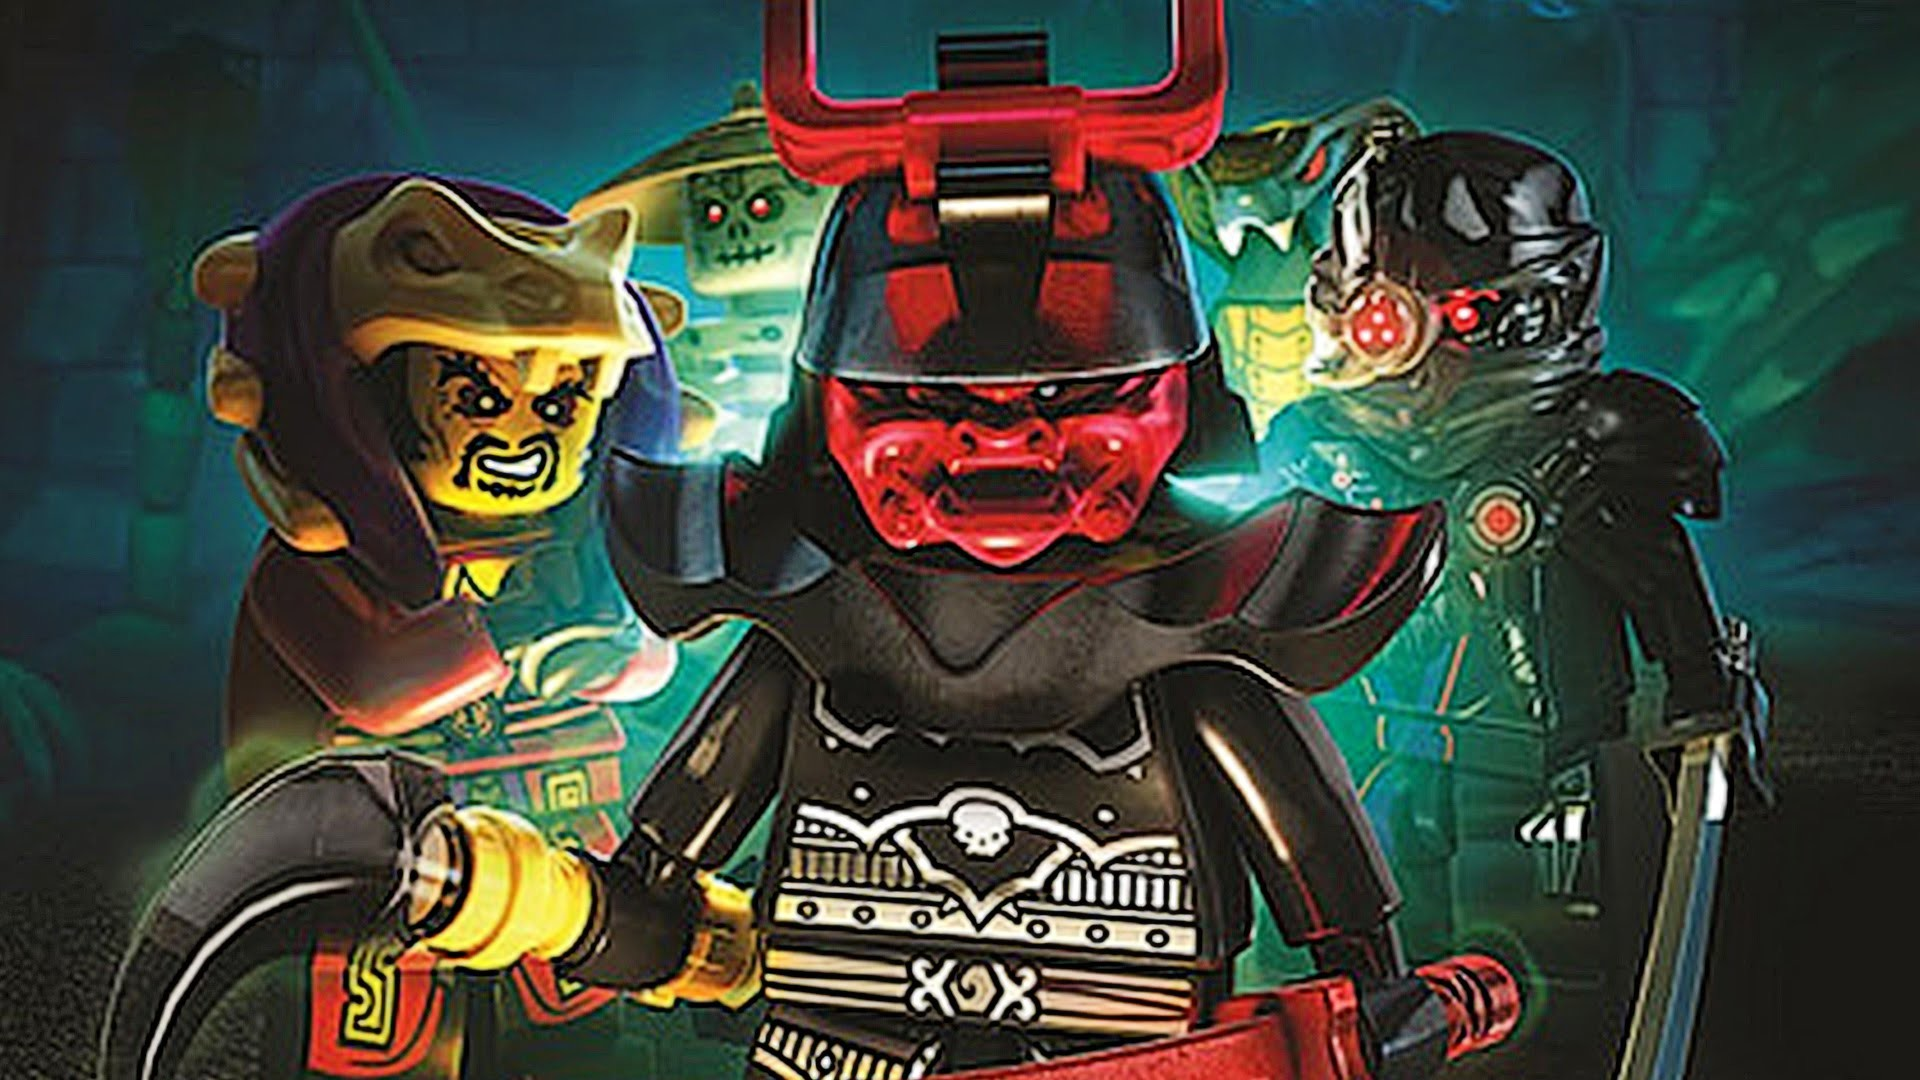 LEGO NINJAGO SHADOW OF RONIN ALL VILLIANS REVEALED! (ANALYSIS & BREAKDOWN)  Screenshot – YouTube